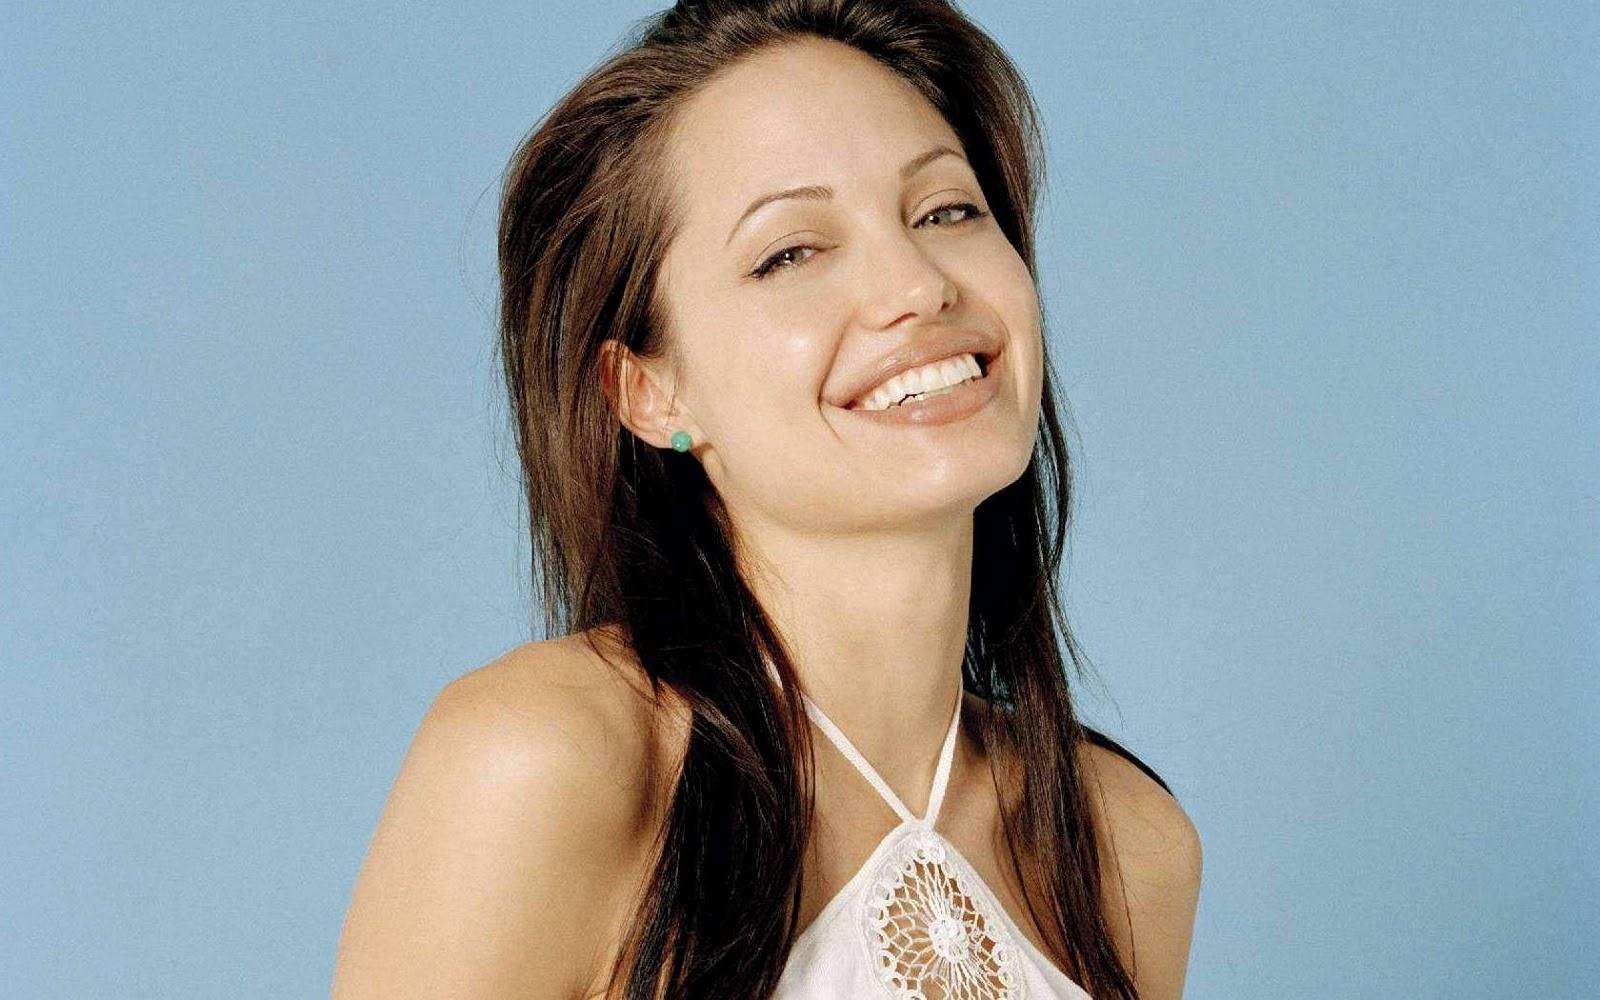 http://2.bp.blogspot.com/-ENwxlQyJvFU/TqvDgDSgKvI/AAAAAAAAADQ/oNSfPAAeIxc/s1600/Angelina+Jolie+%25281%2529.jpg